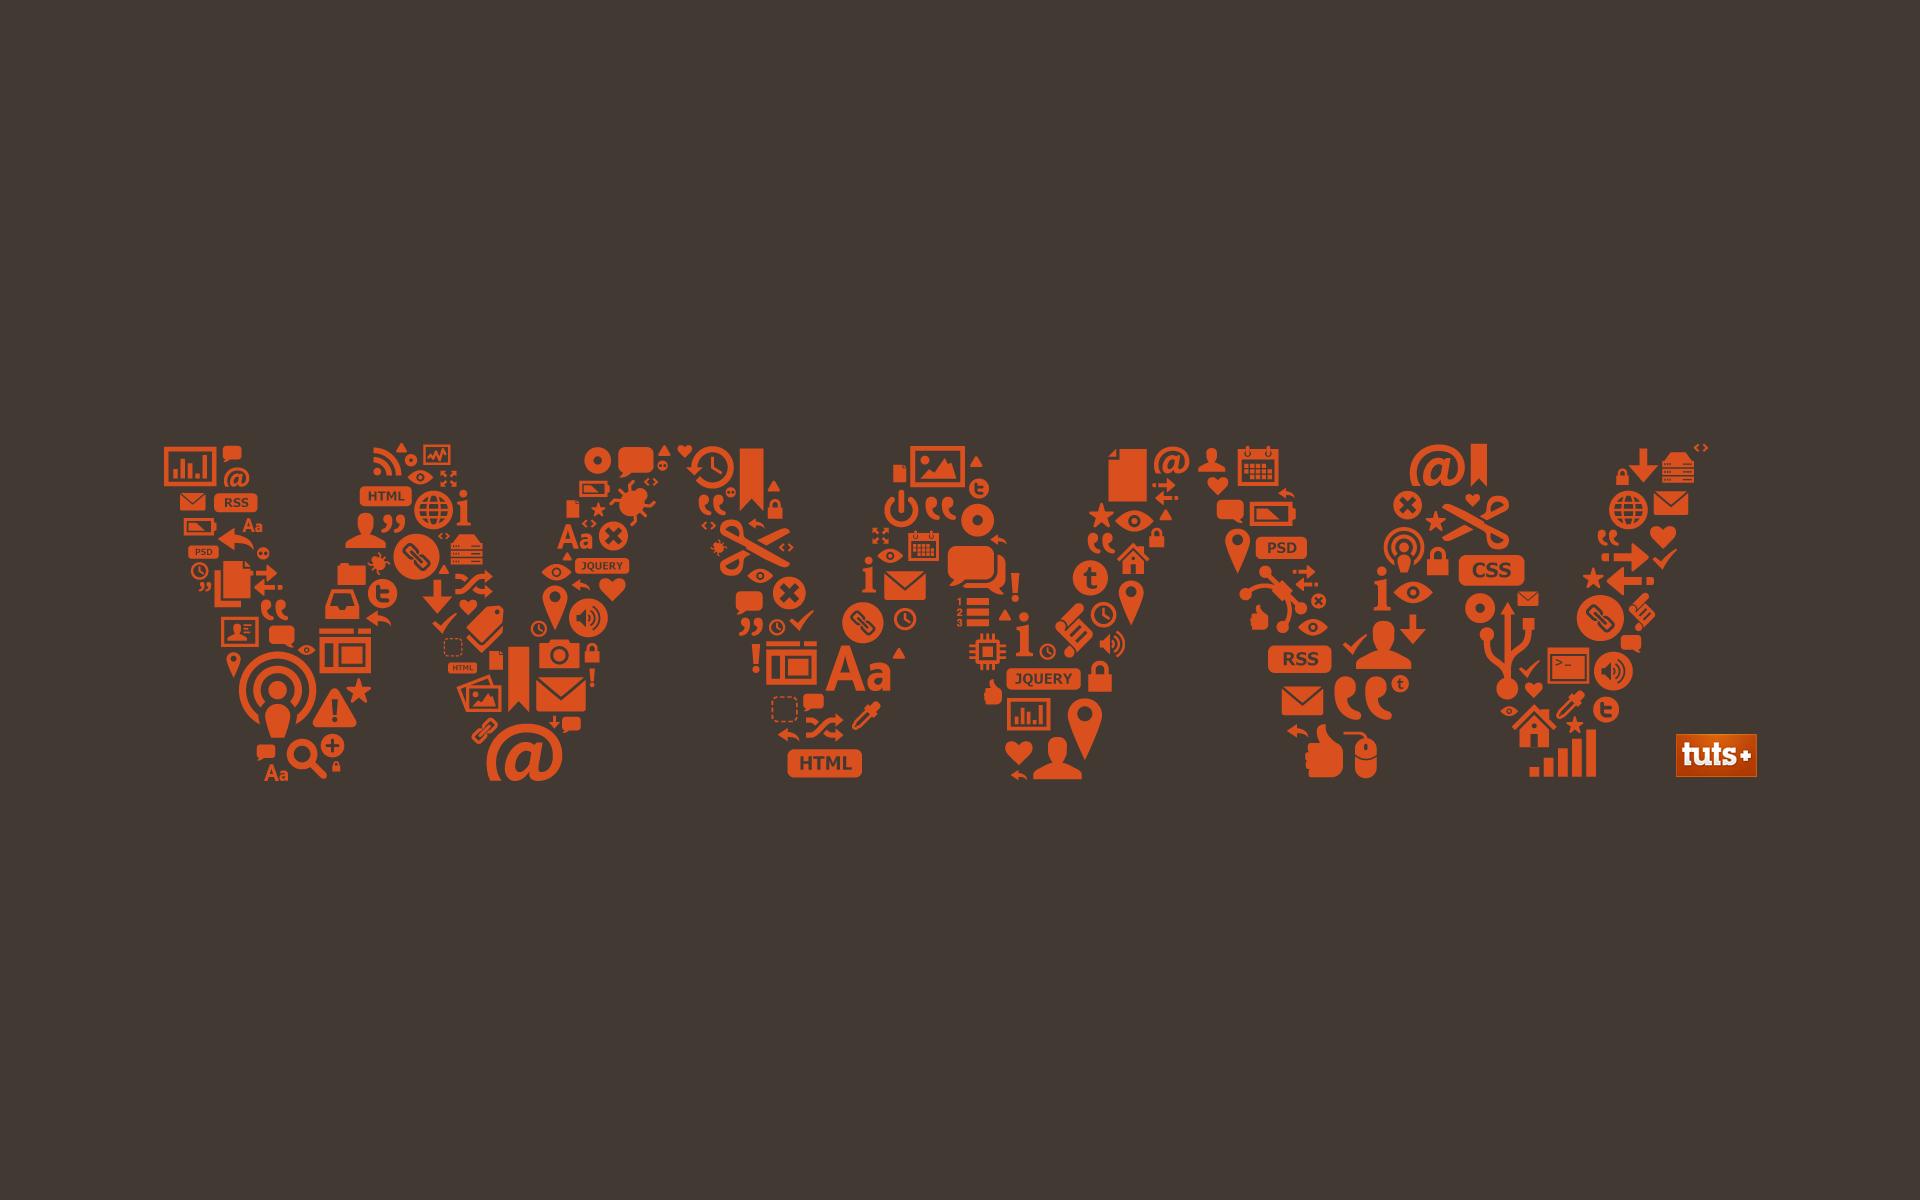 Web Design Wallpapers - Wallpaper Cave